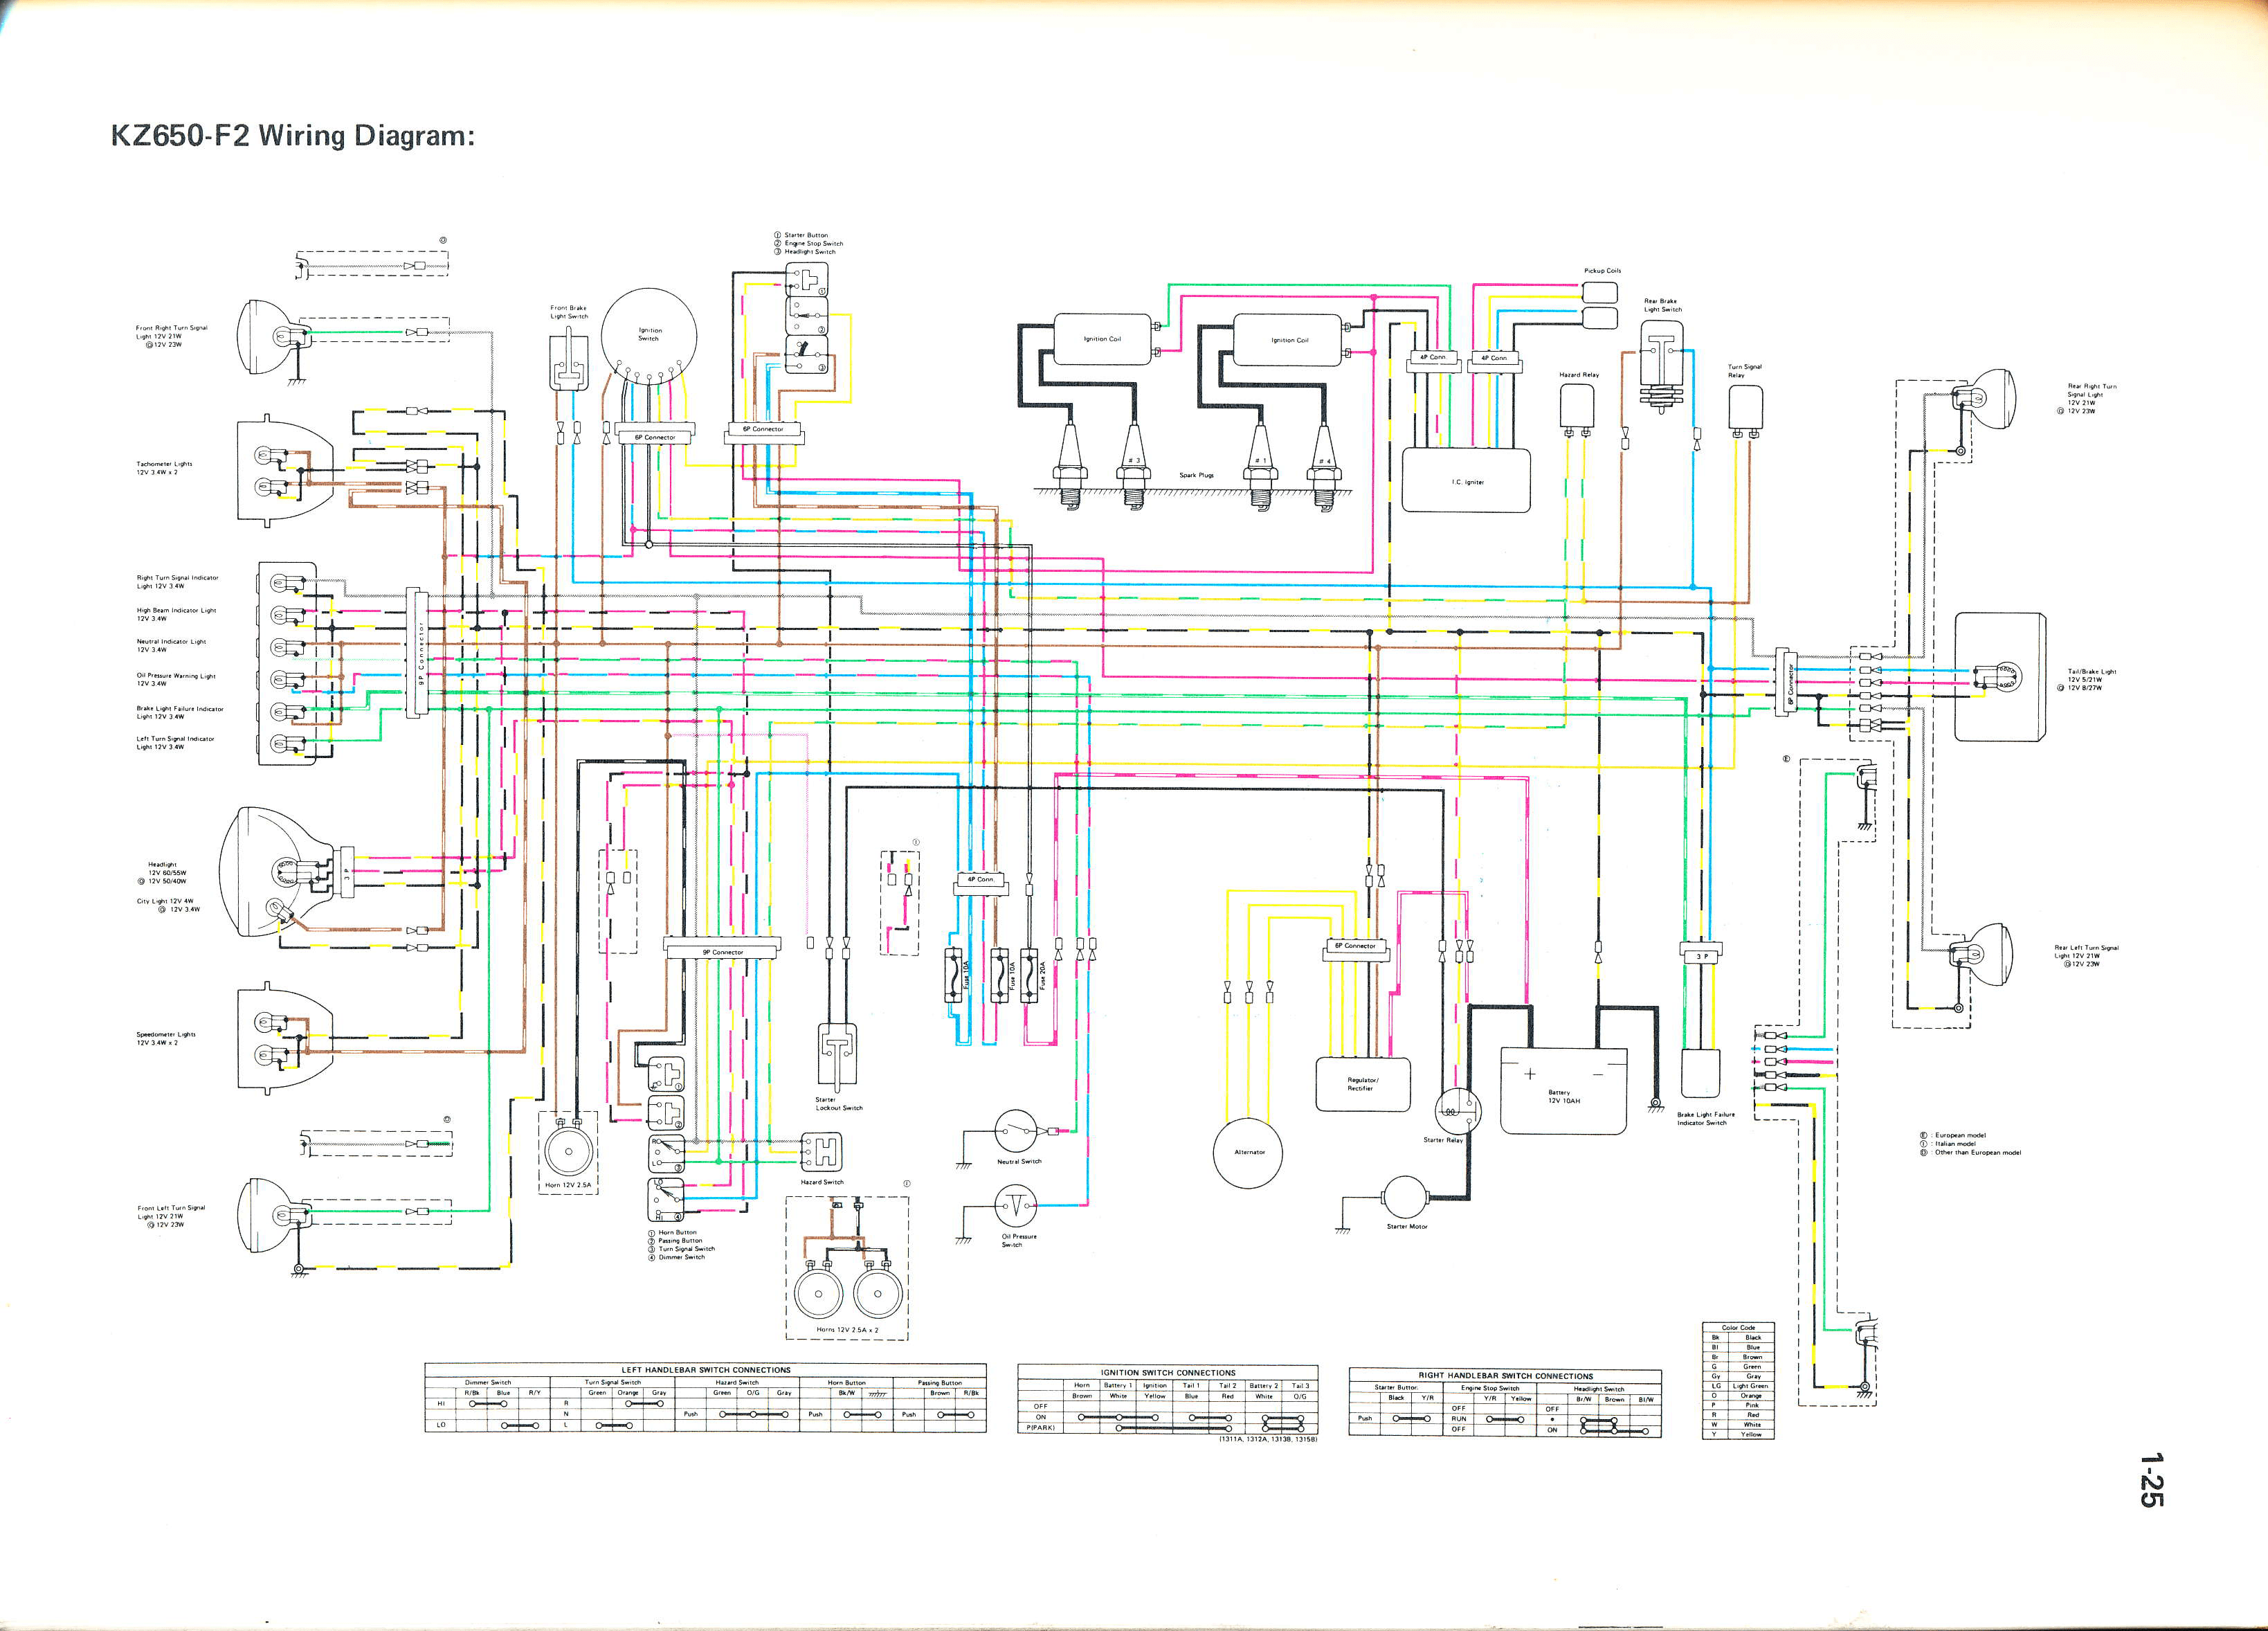 ge_4411] 2002 foreman 500 wiring diagram  xtern cali rious over wigeg mohammedshrine librar wiring 101